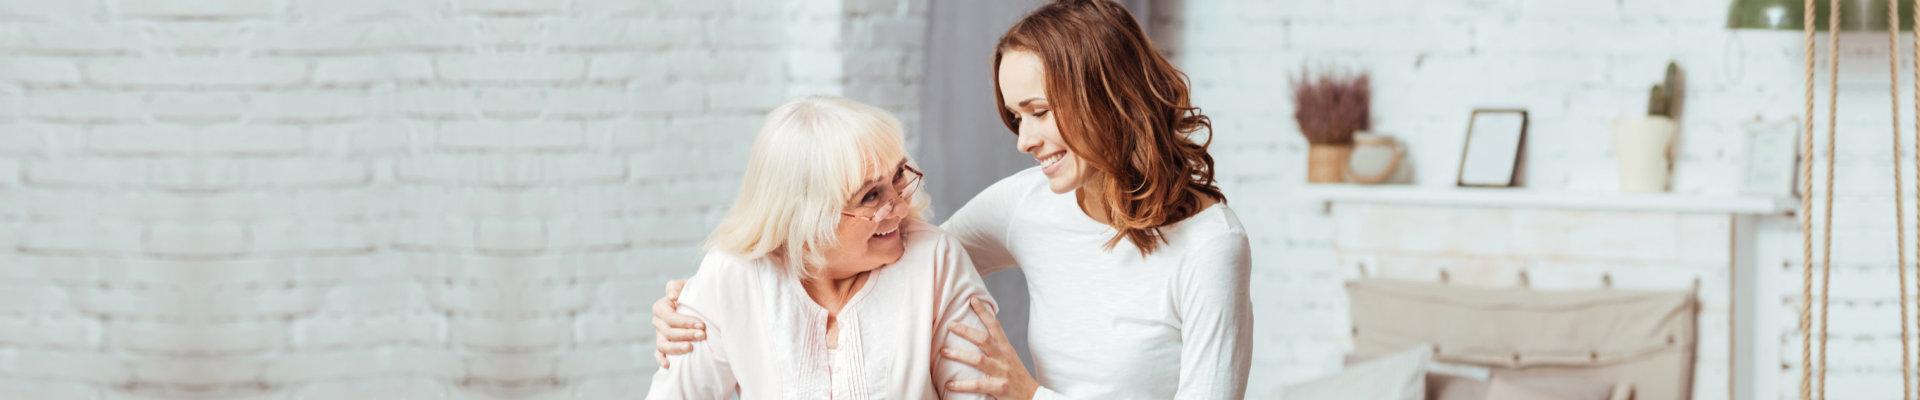 caregiver assisting an elderly lady